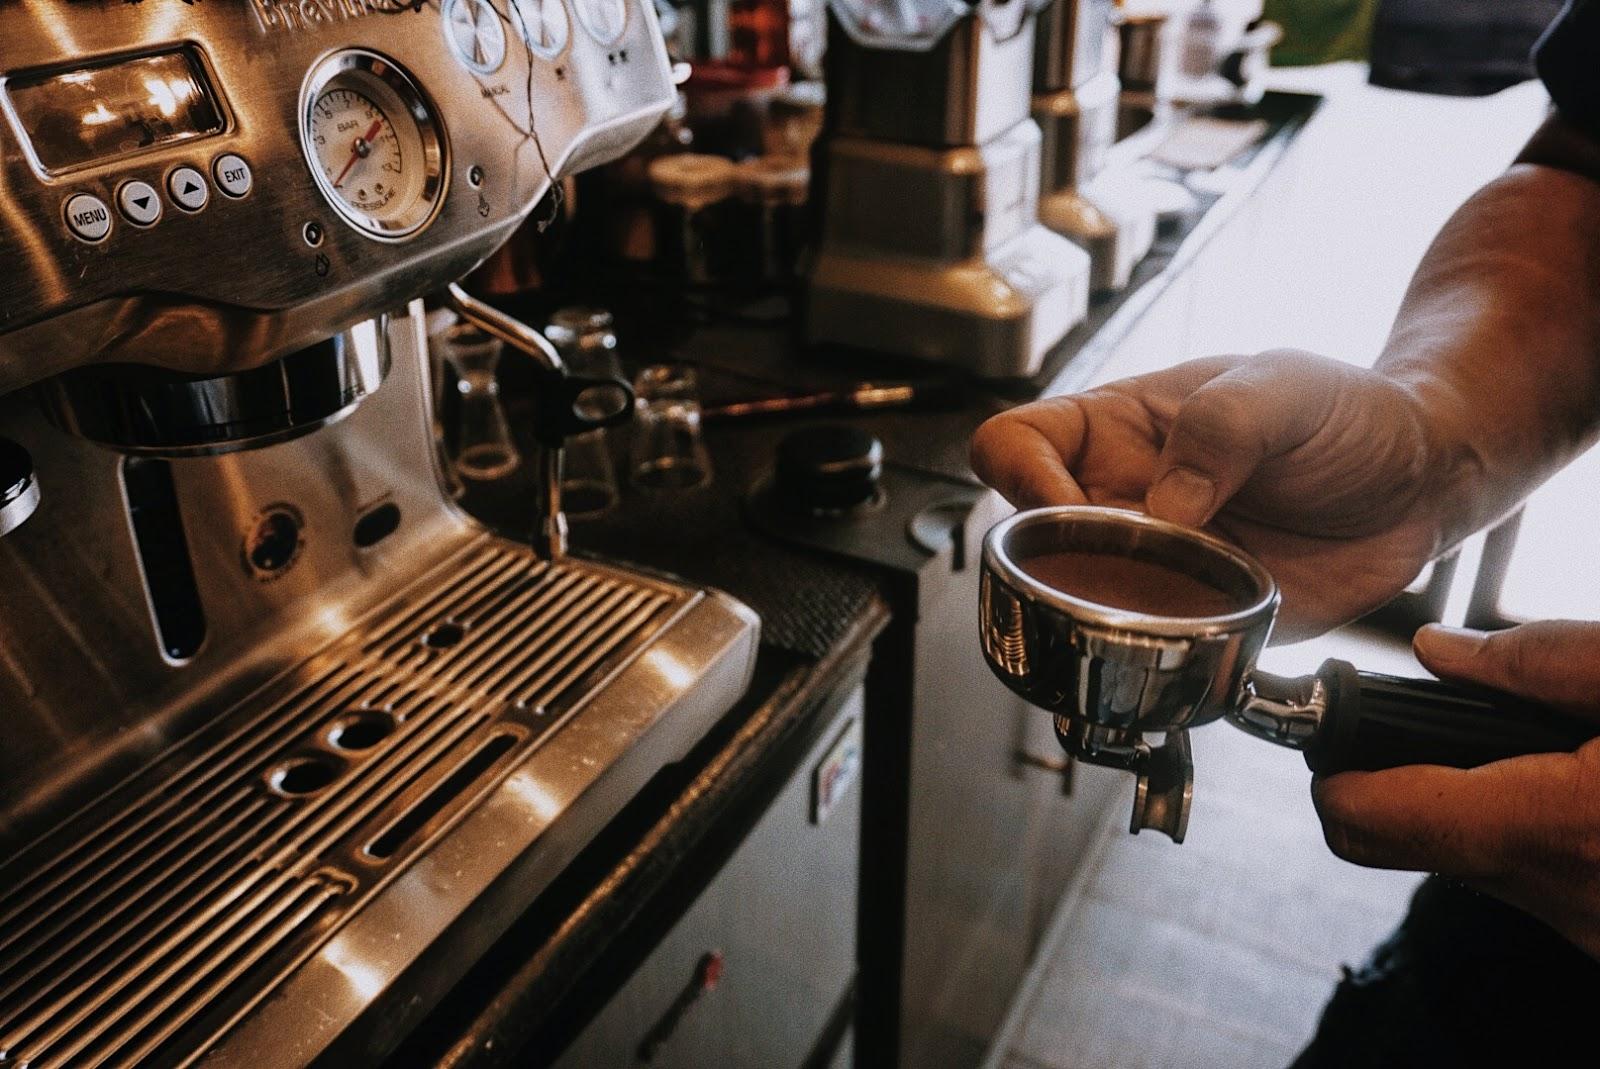 BLOGGERS-ALMOSTABLOGGER-CEBU-COFFEETERIA-COFFEESHOPS.jpg